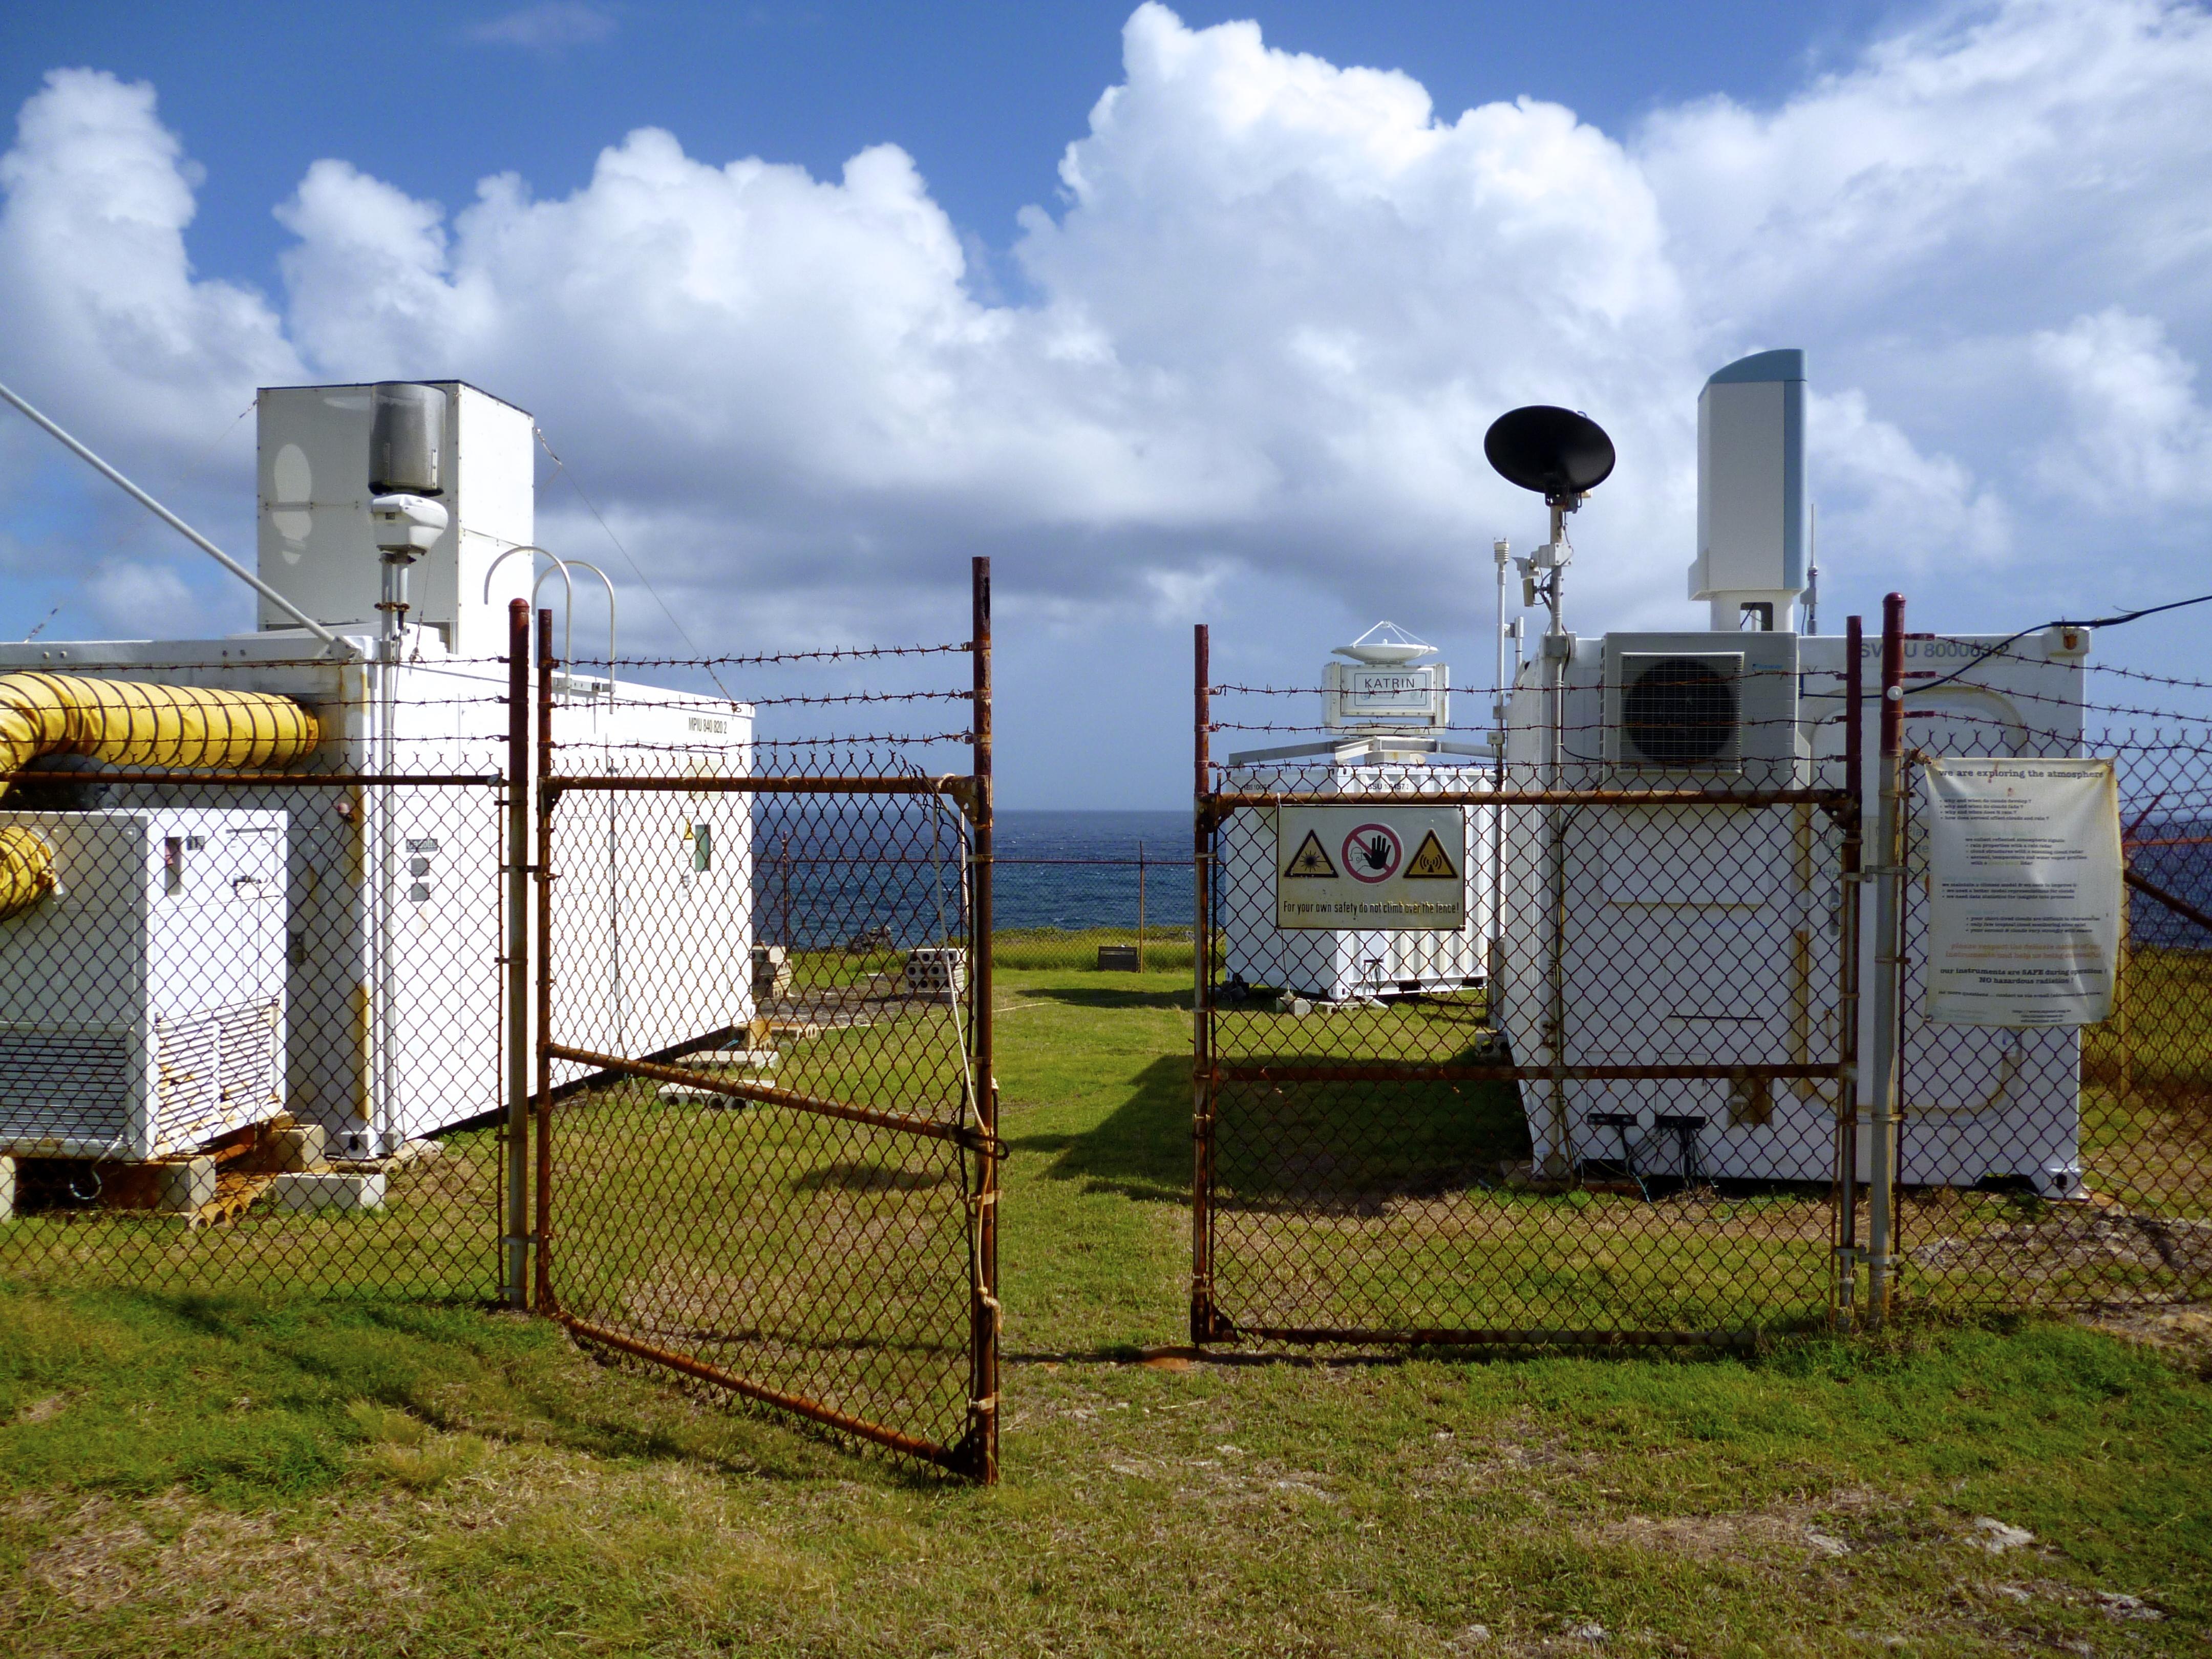 barrera station Barbados